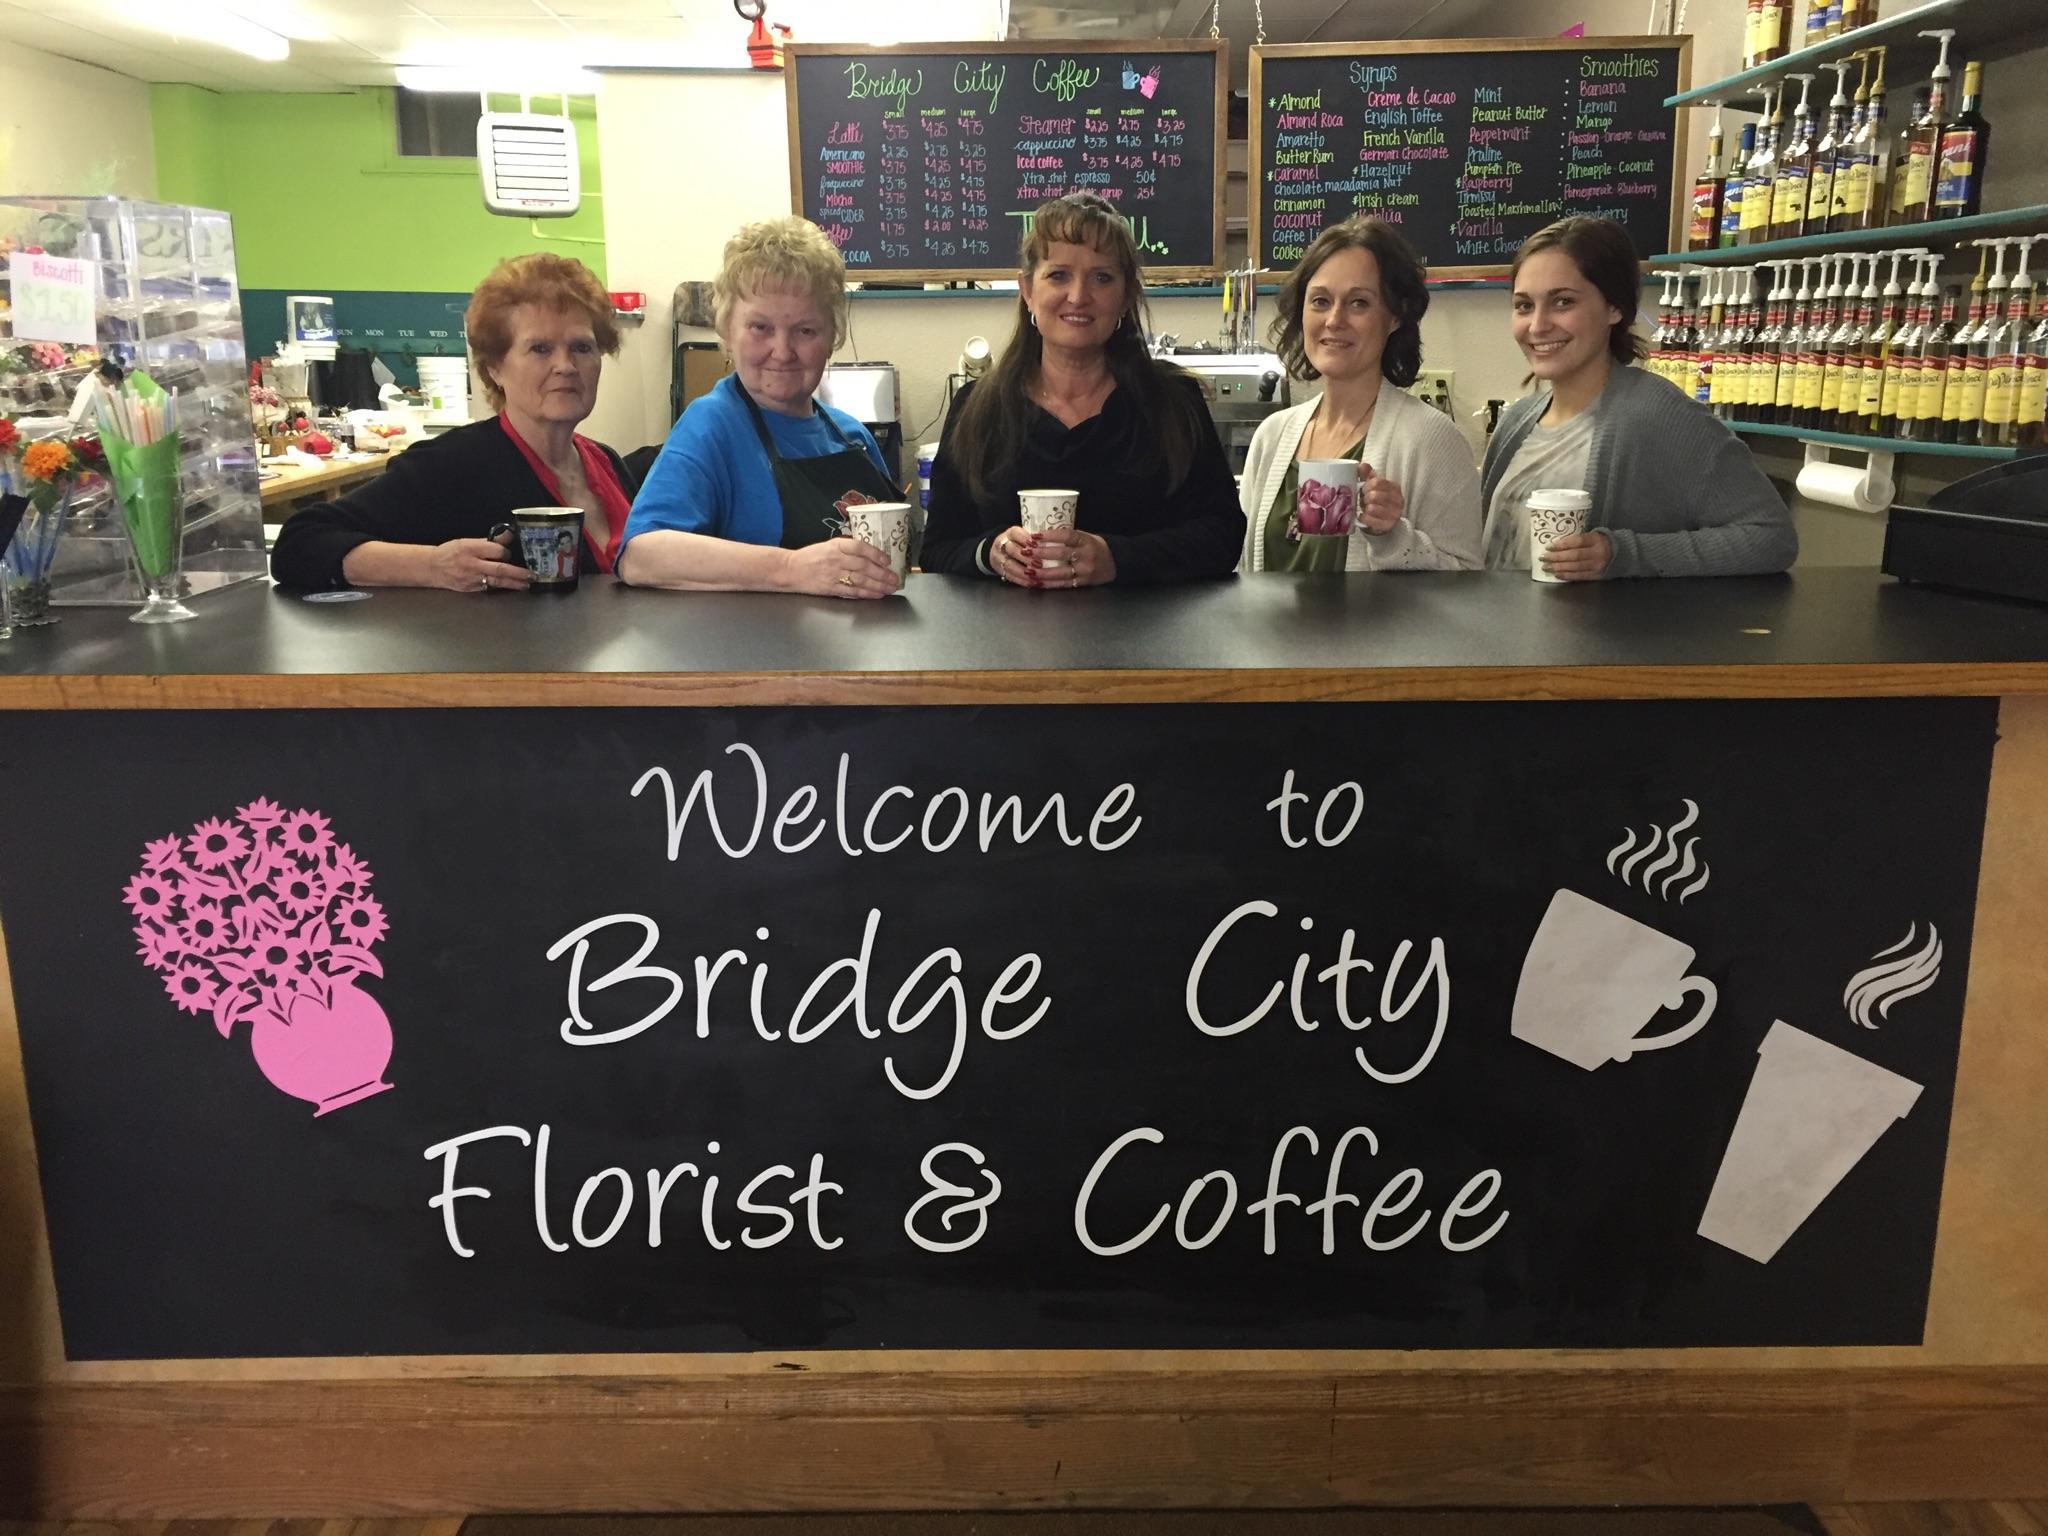 Bridge City Florist & Coffee, Mobridge SD